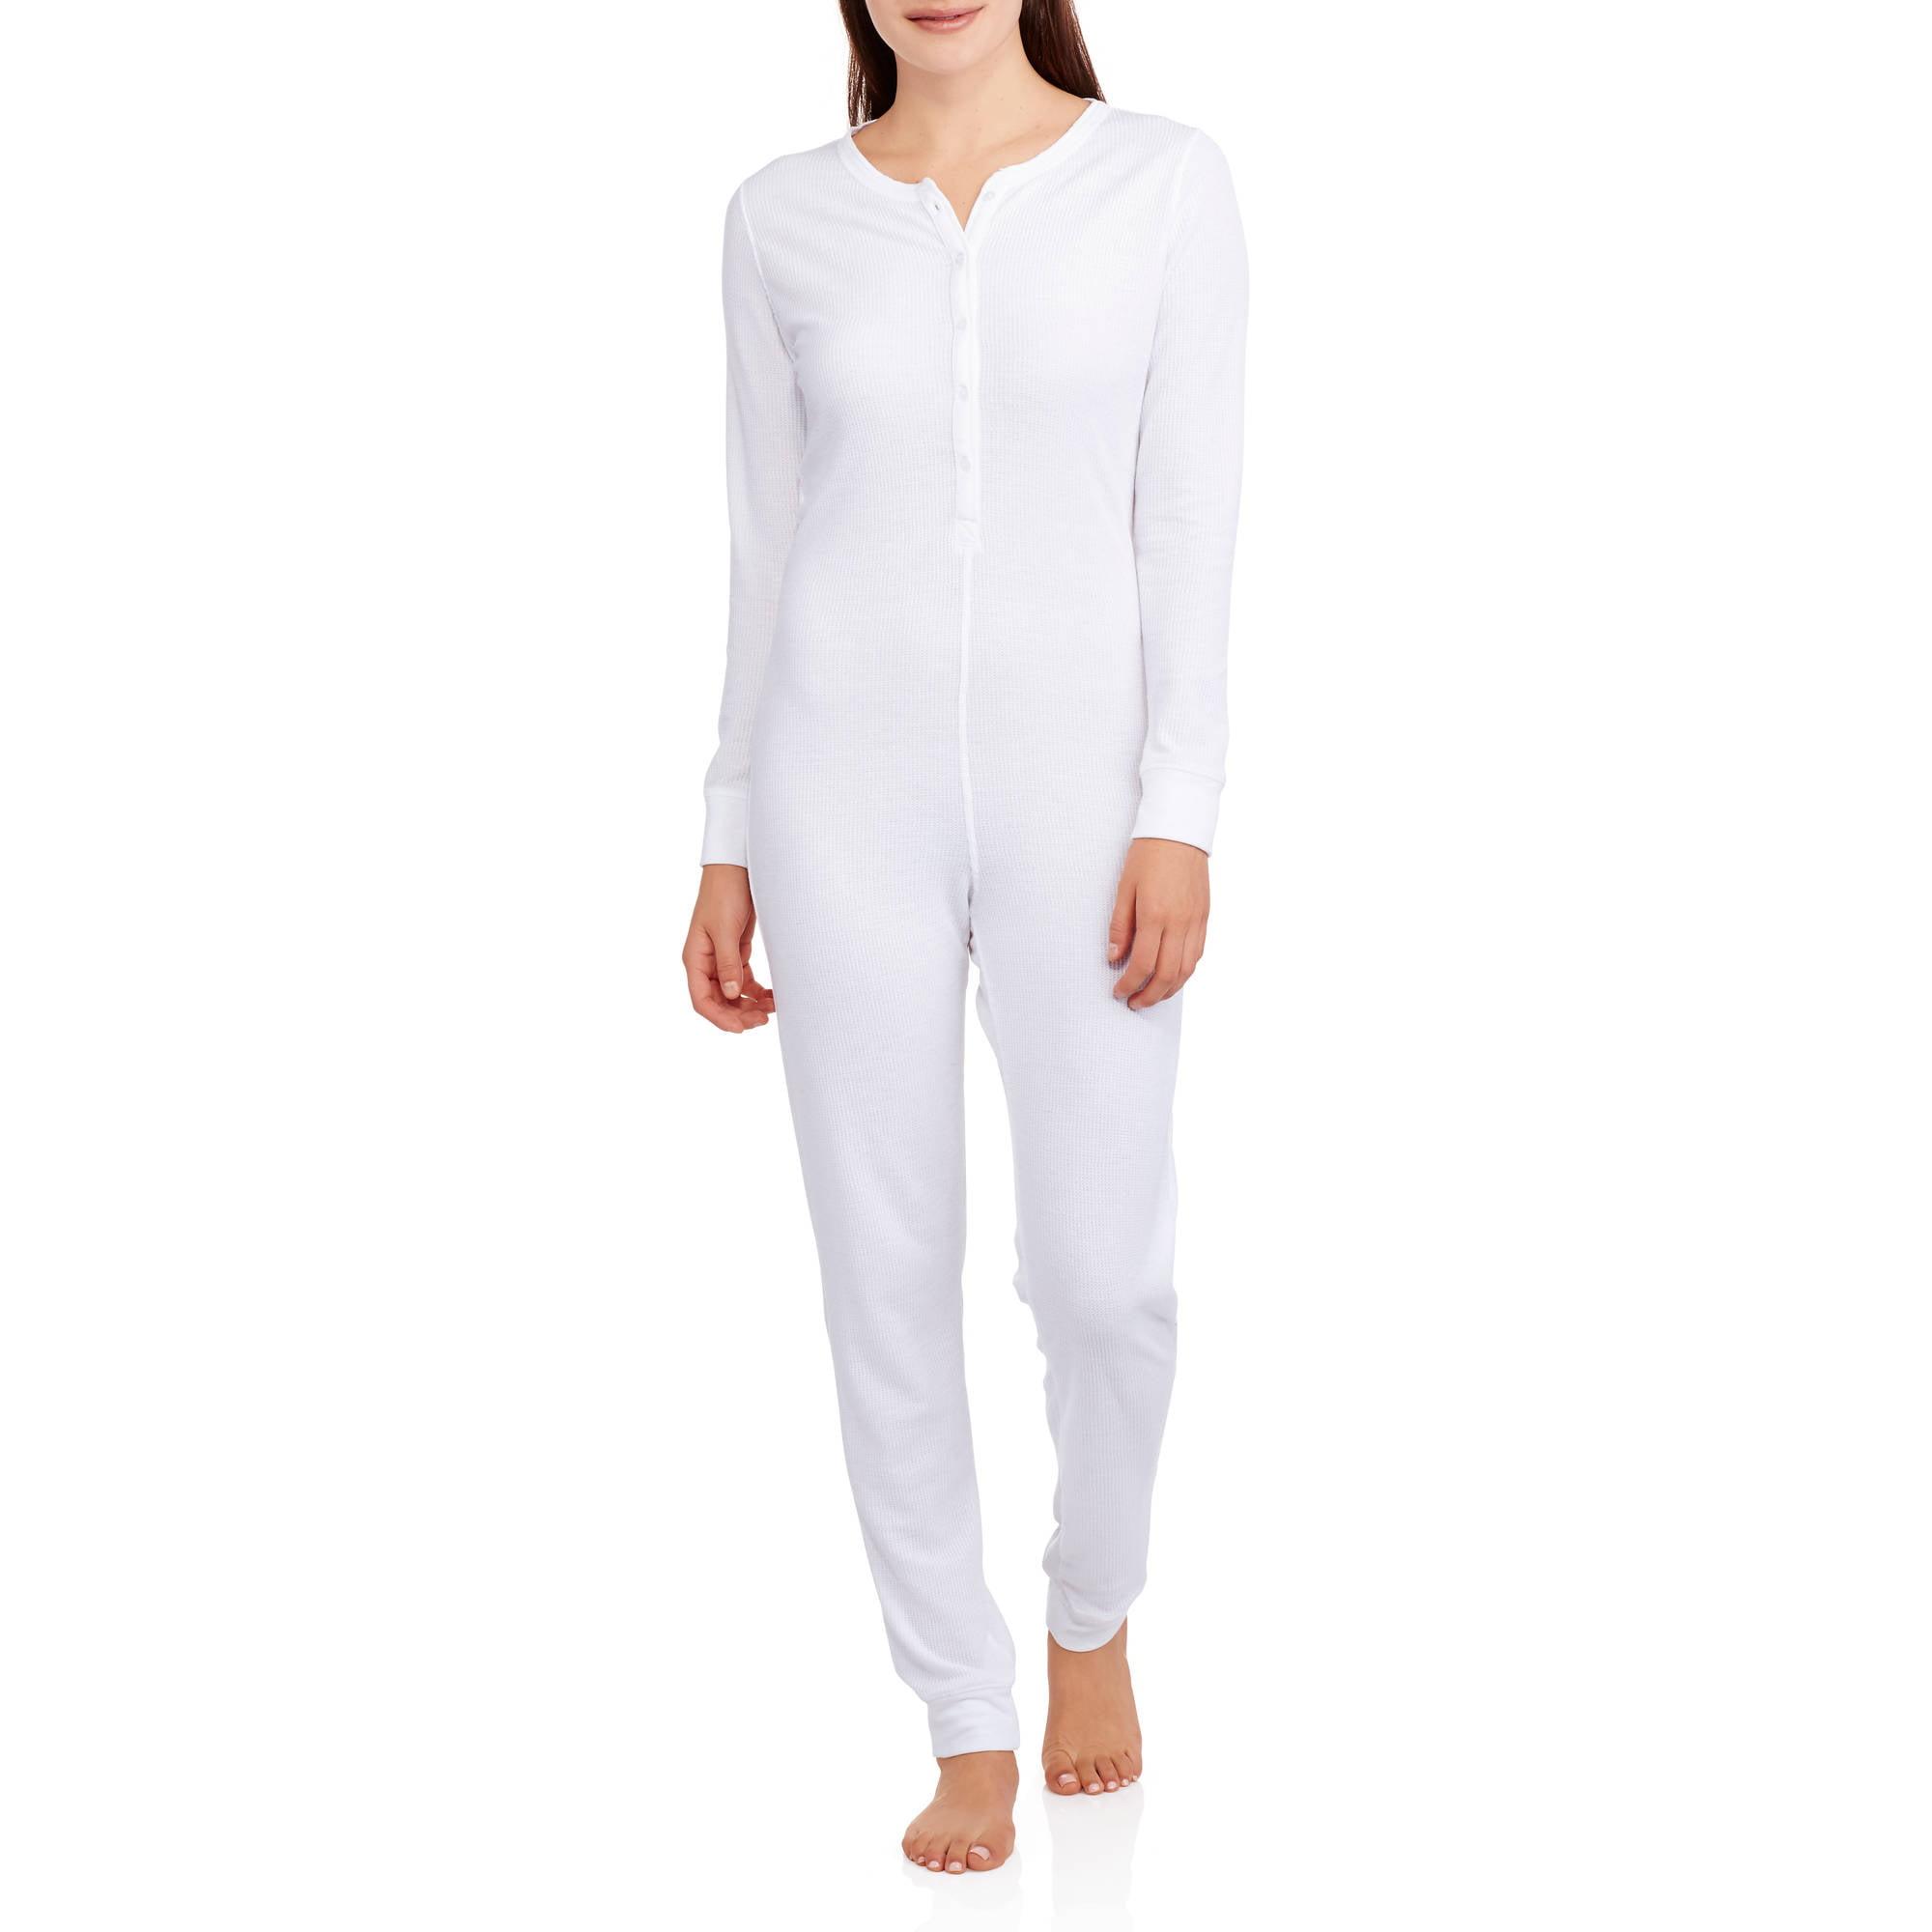 b47d6a3d5650 Adult Onesie Costume Pajamas